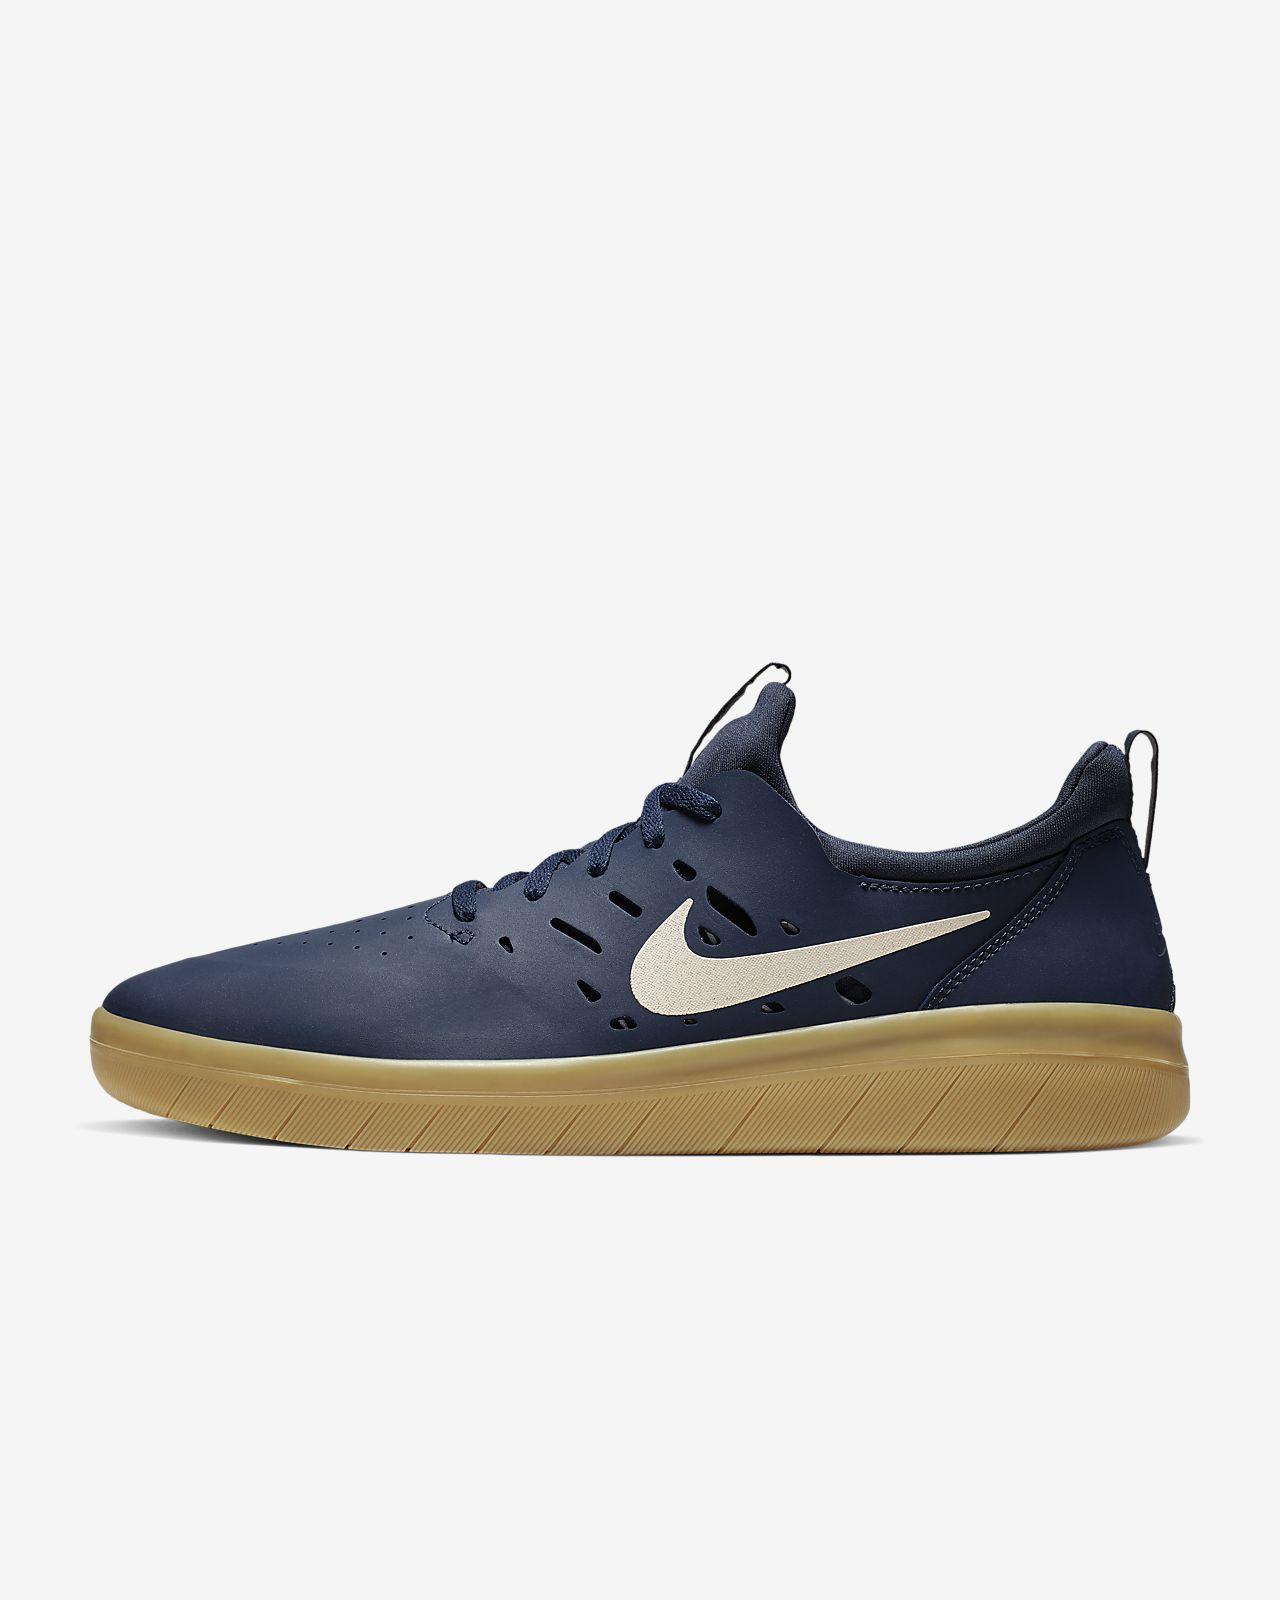 Chaussure de skateboard Nike SB Nyjah Free